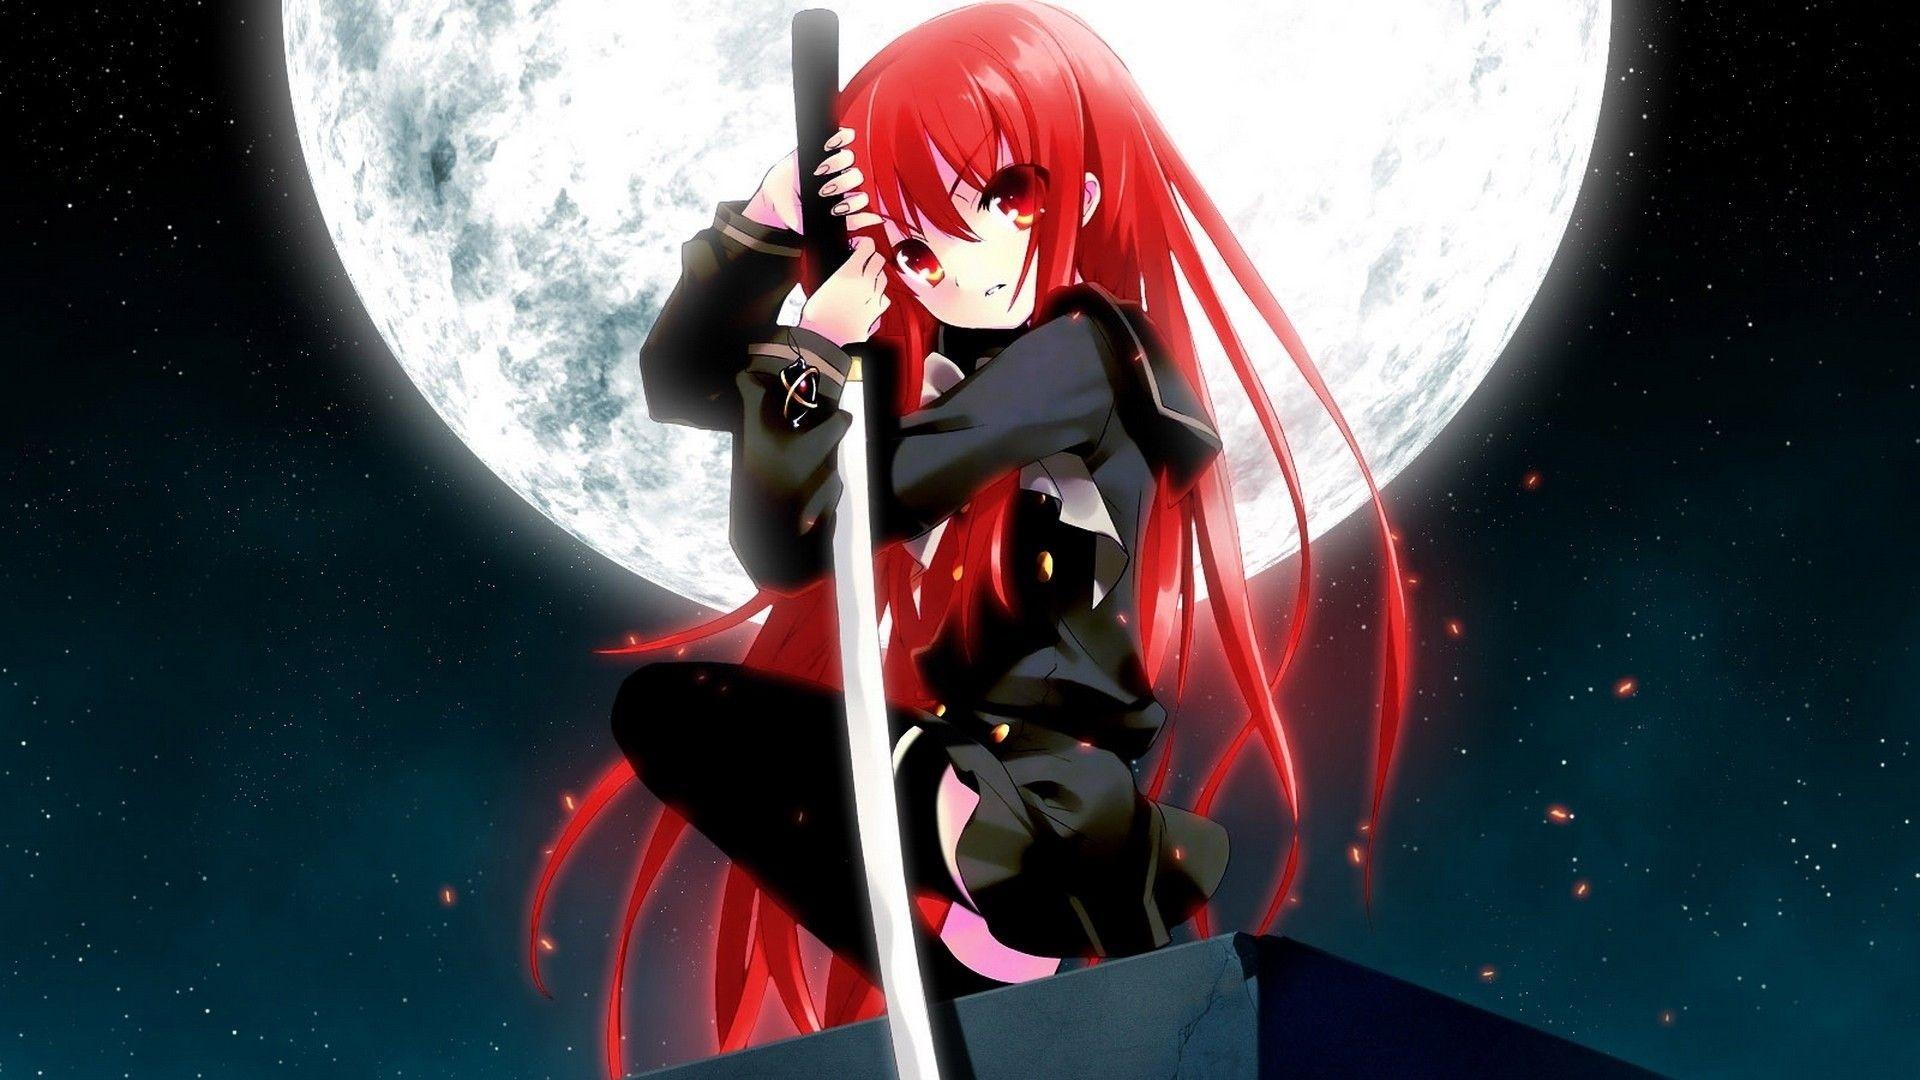 Red Anime Girl Free Wallpaper